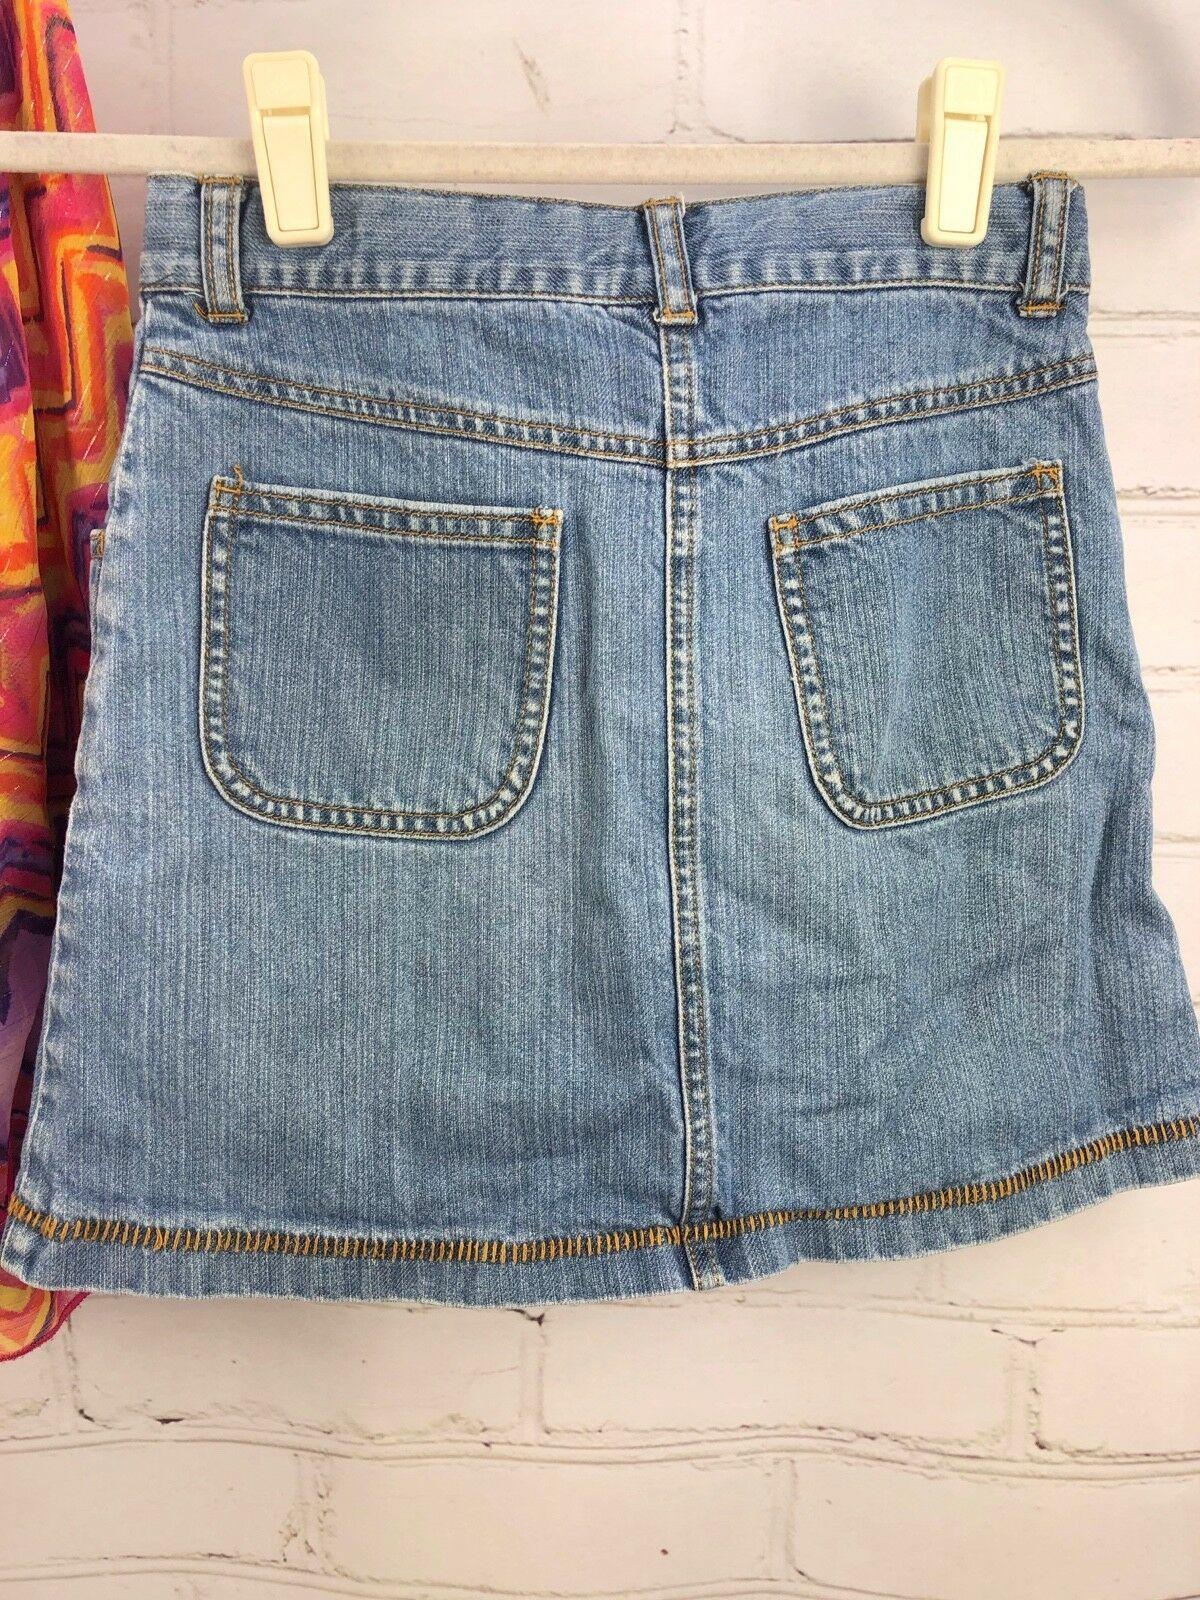 Justice Outfit Set - Boho Flowing Loose Poncho Top + Jean Skirt Skort Sz 10 image 4